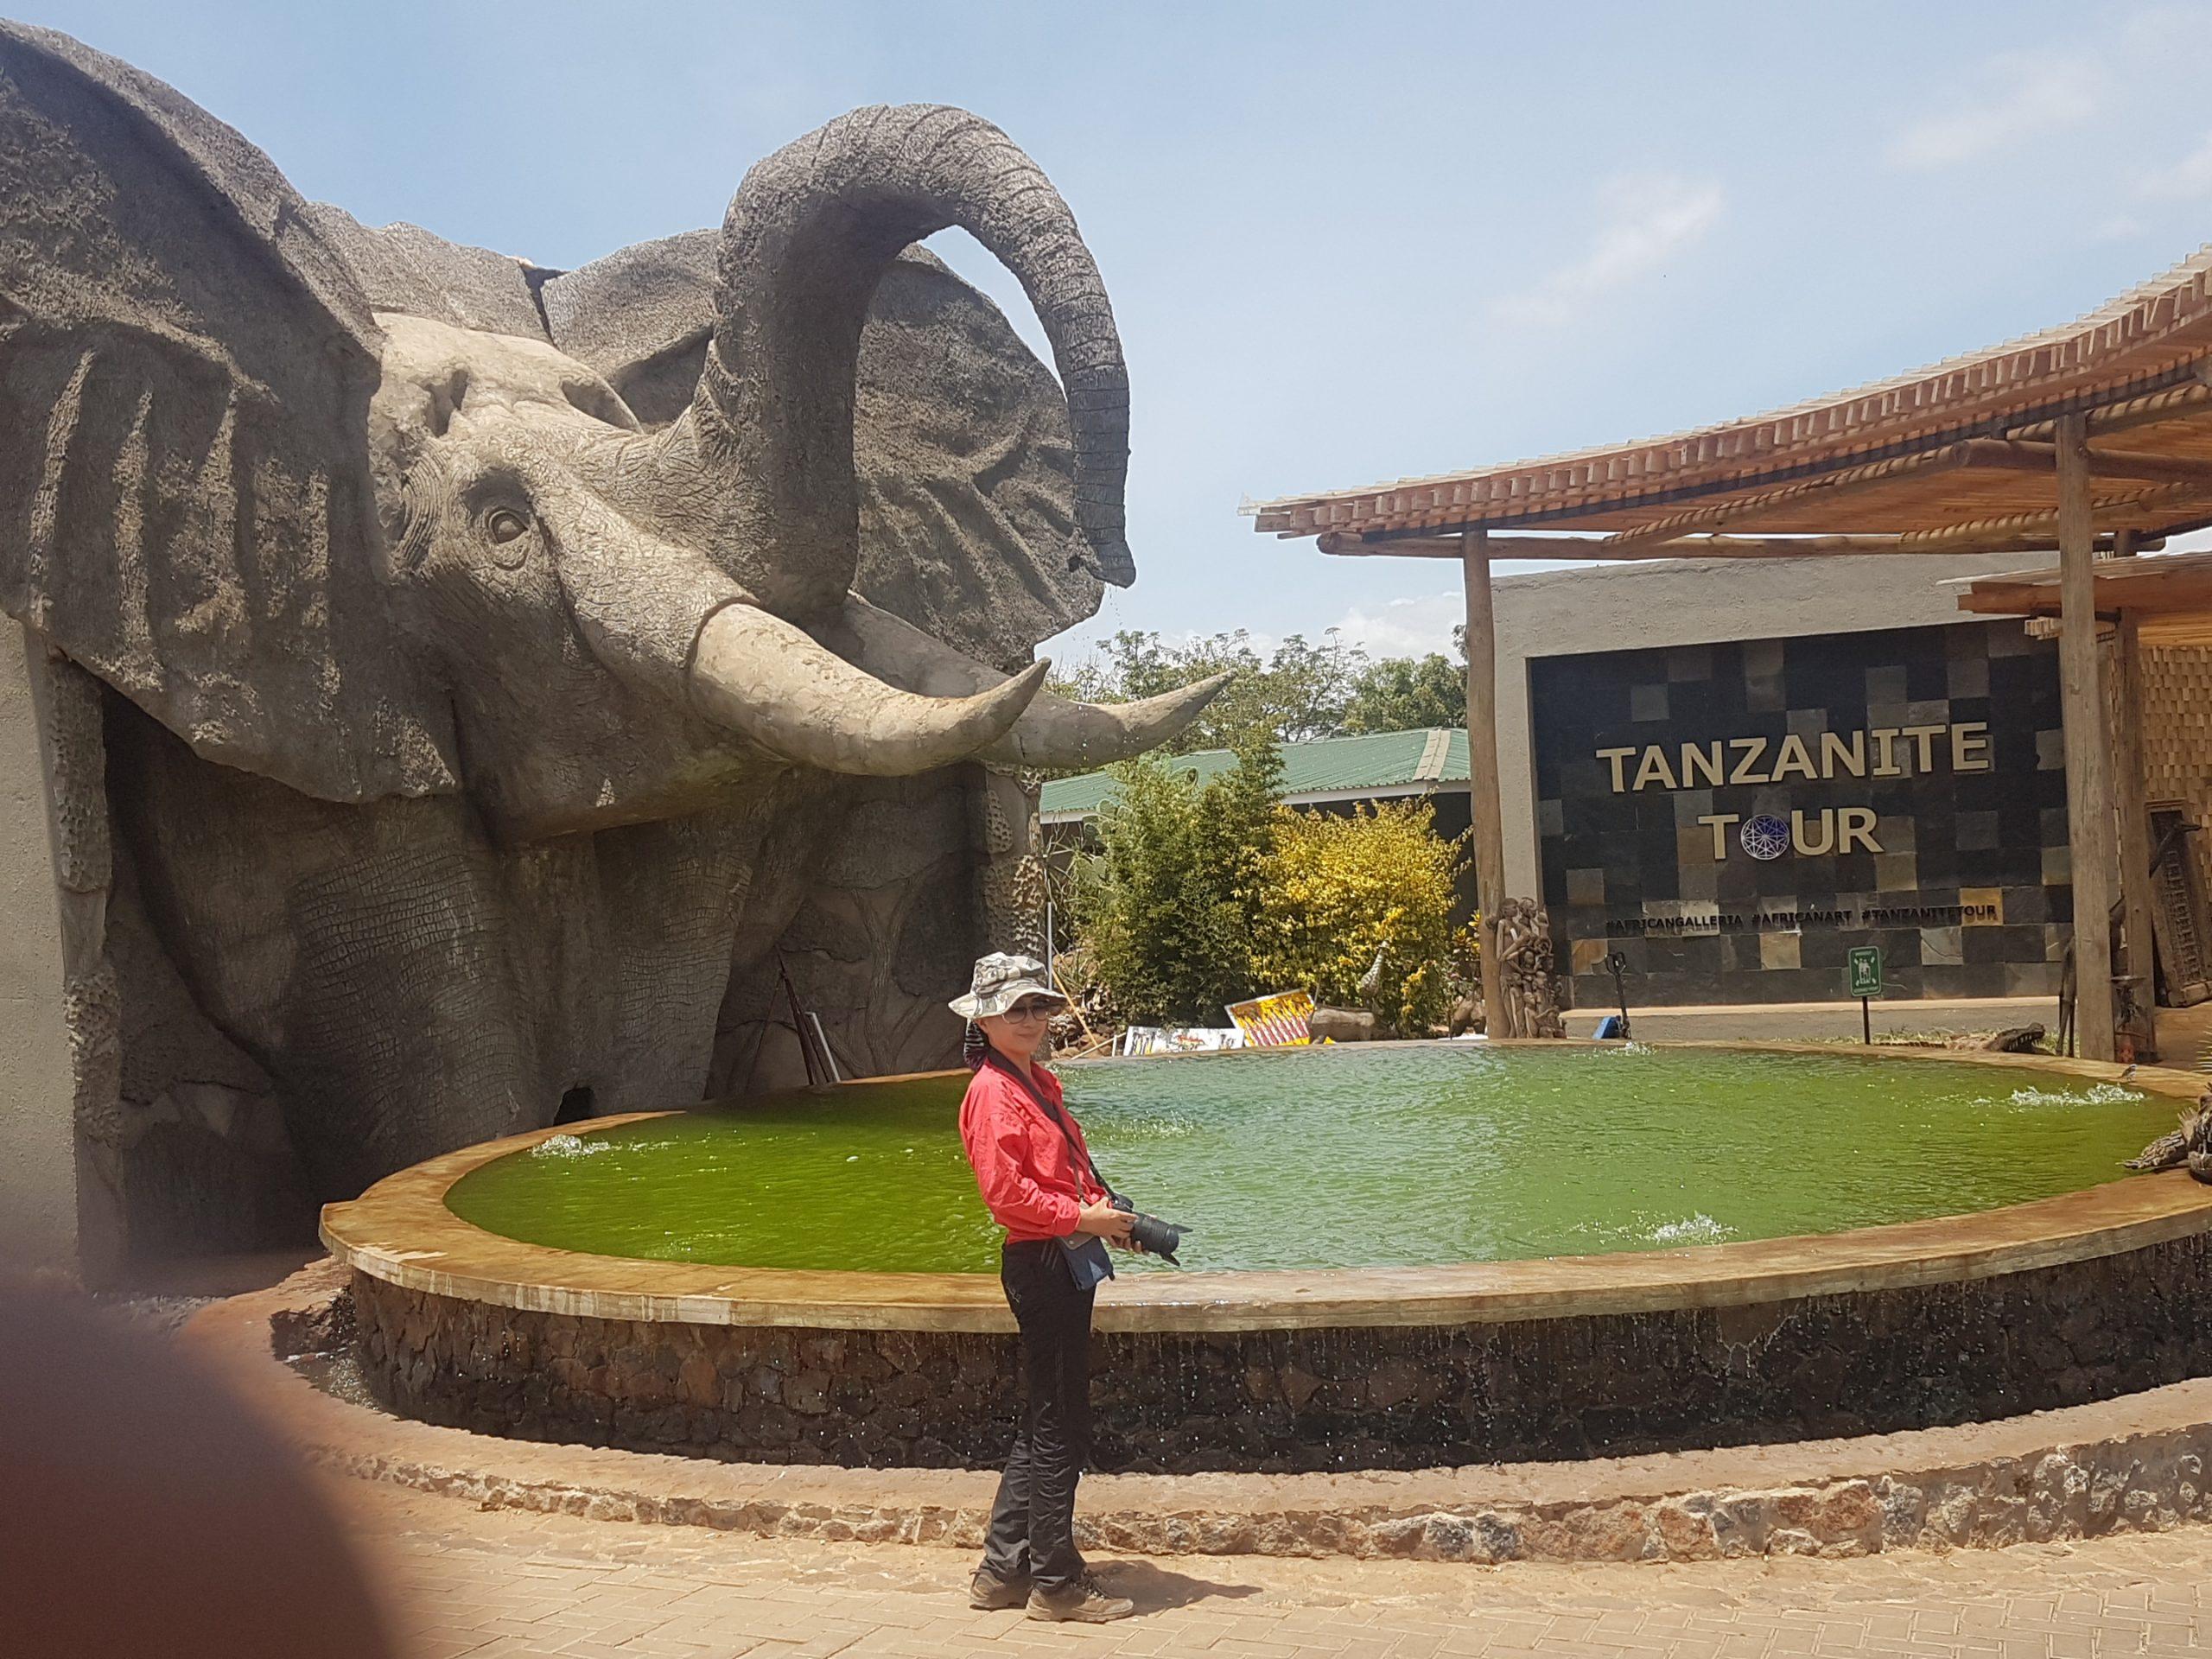 Tanzanite gallery